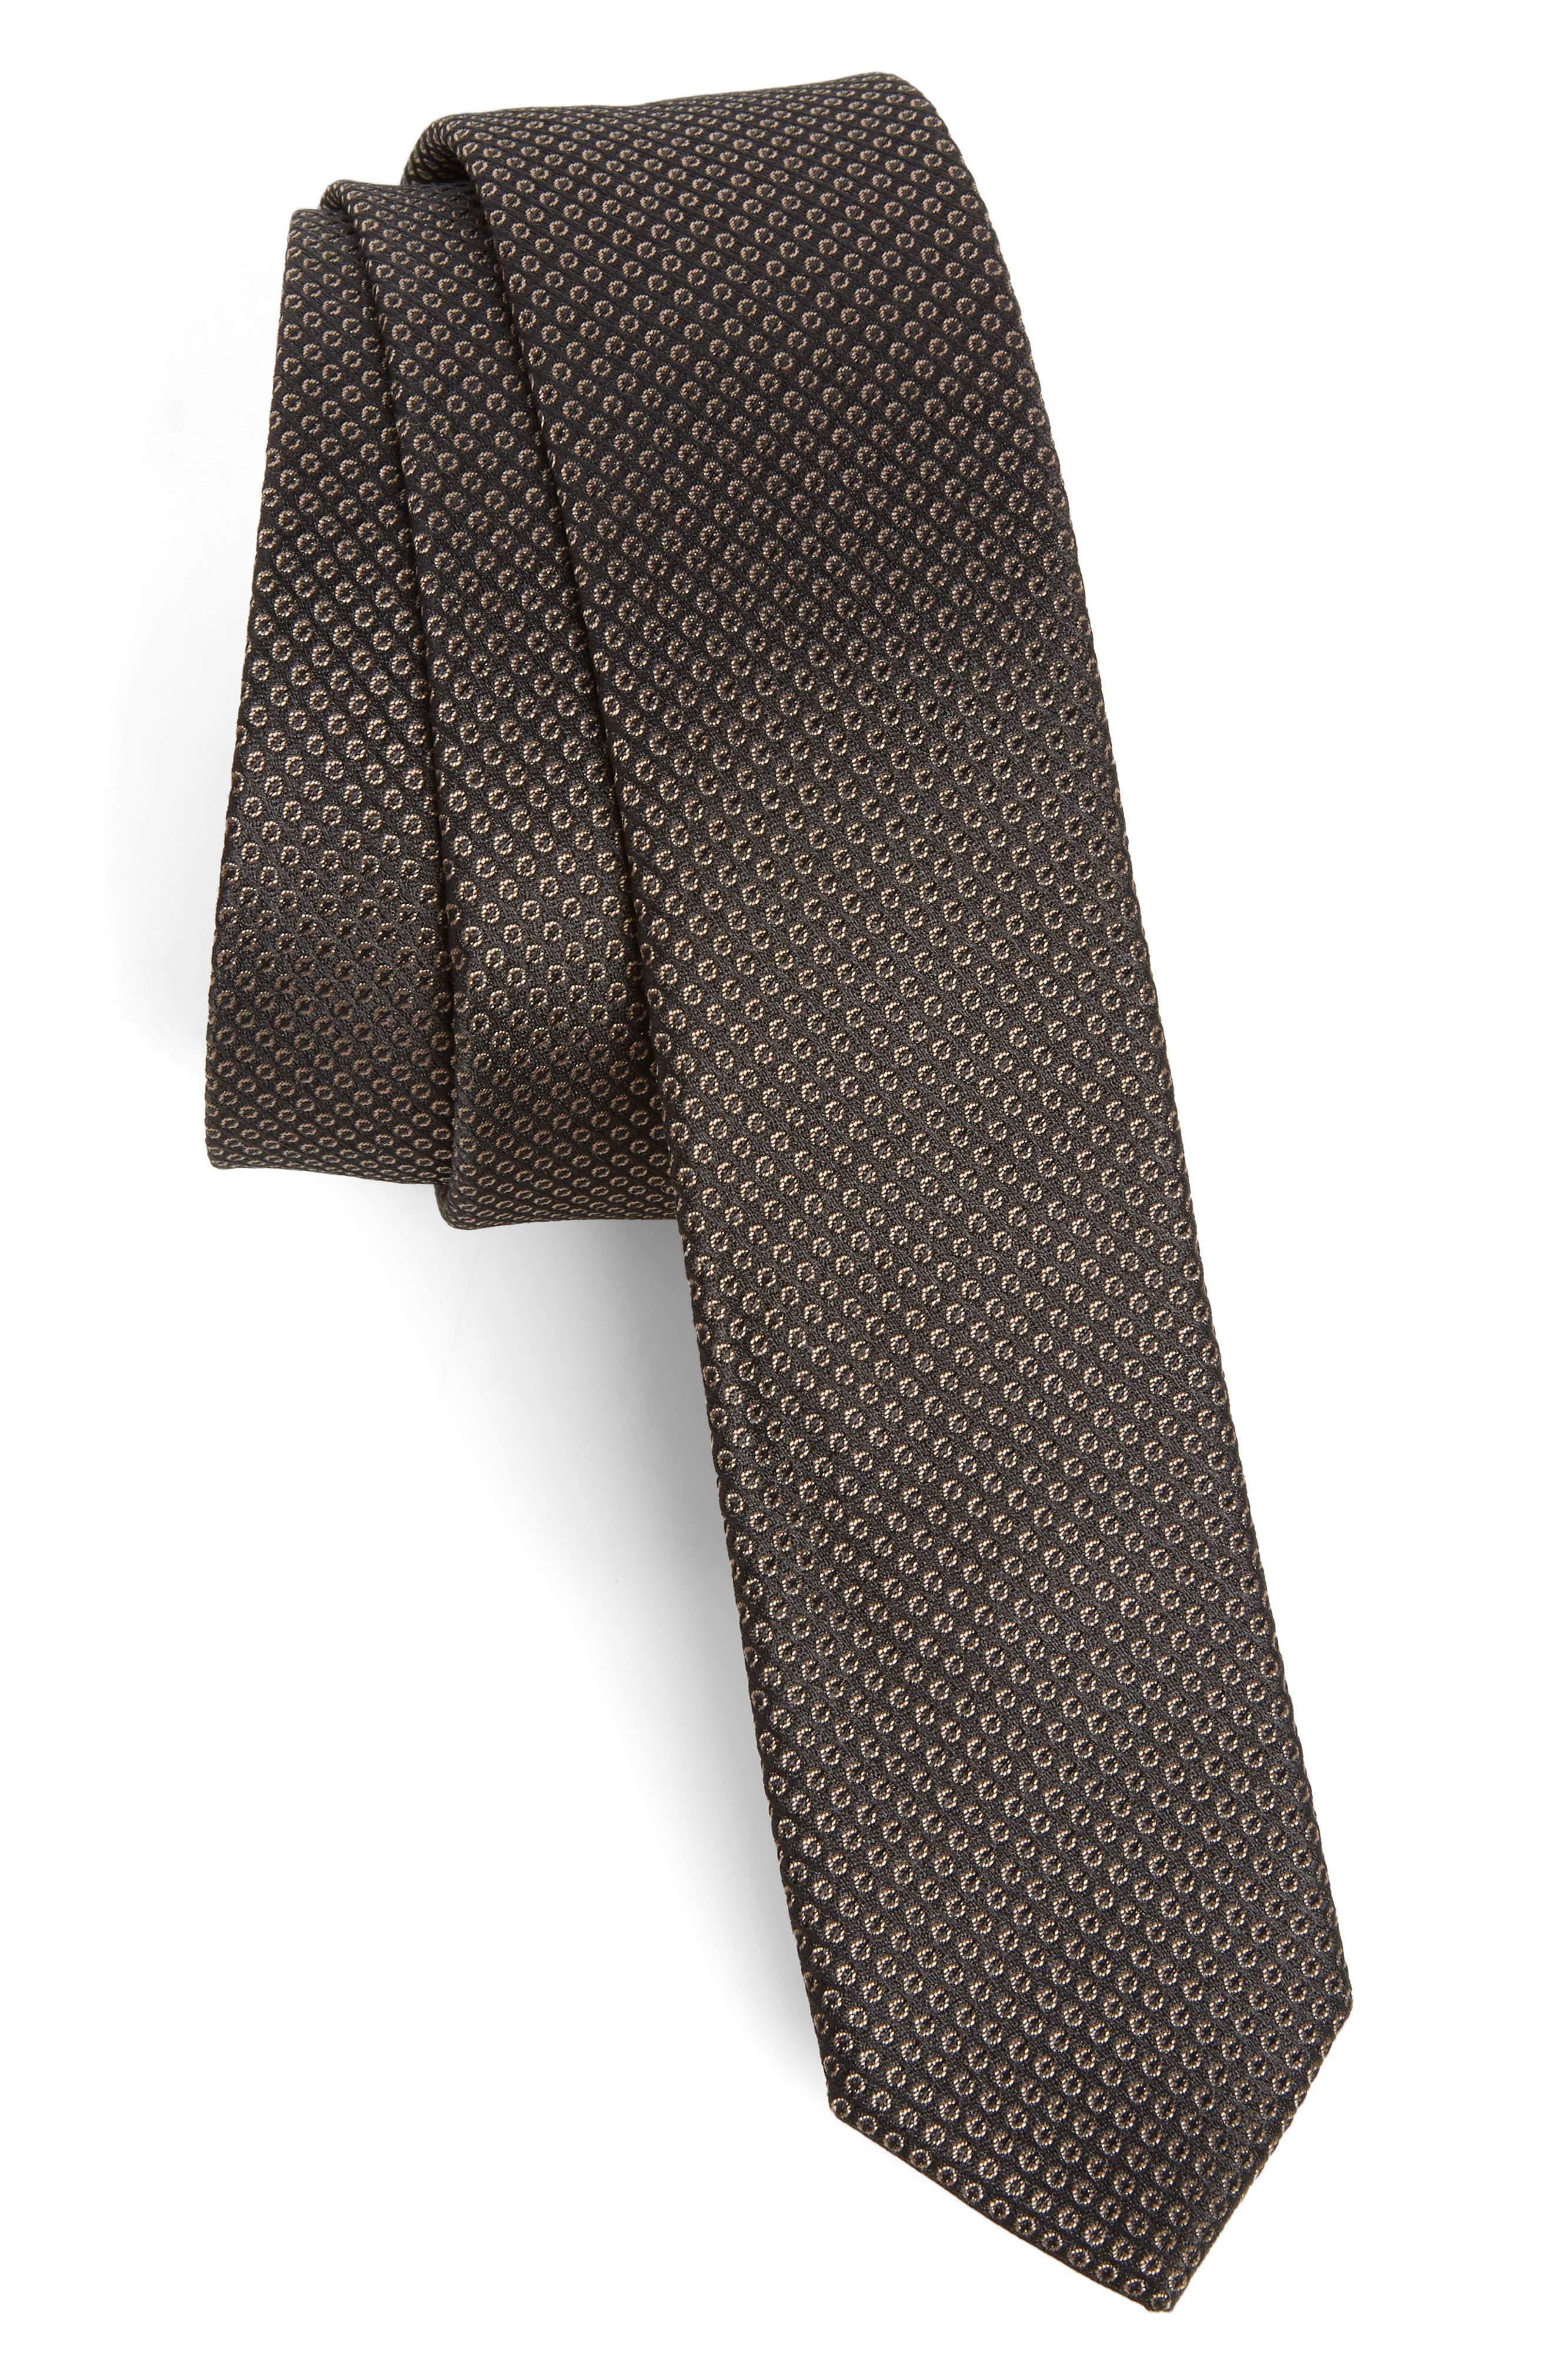 Dot Pattern Silk Skinny Tie,                             Main thumbnail 1, color,                             200